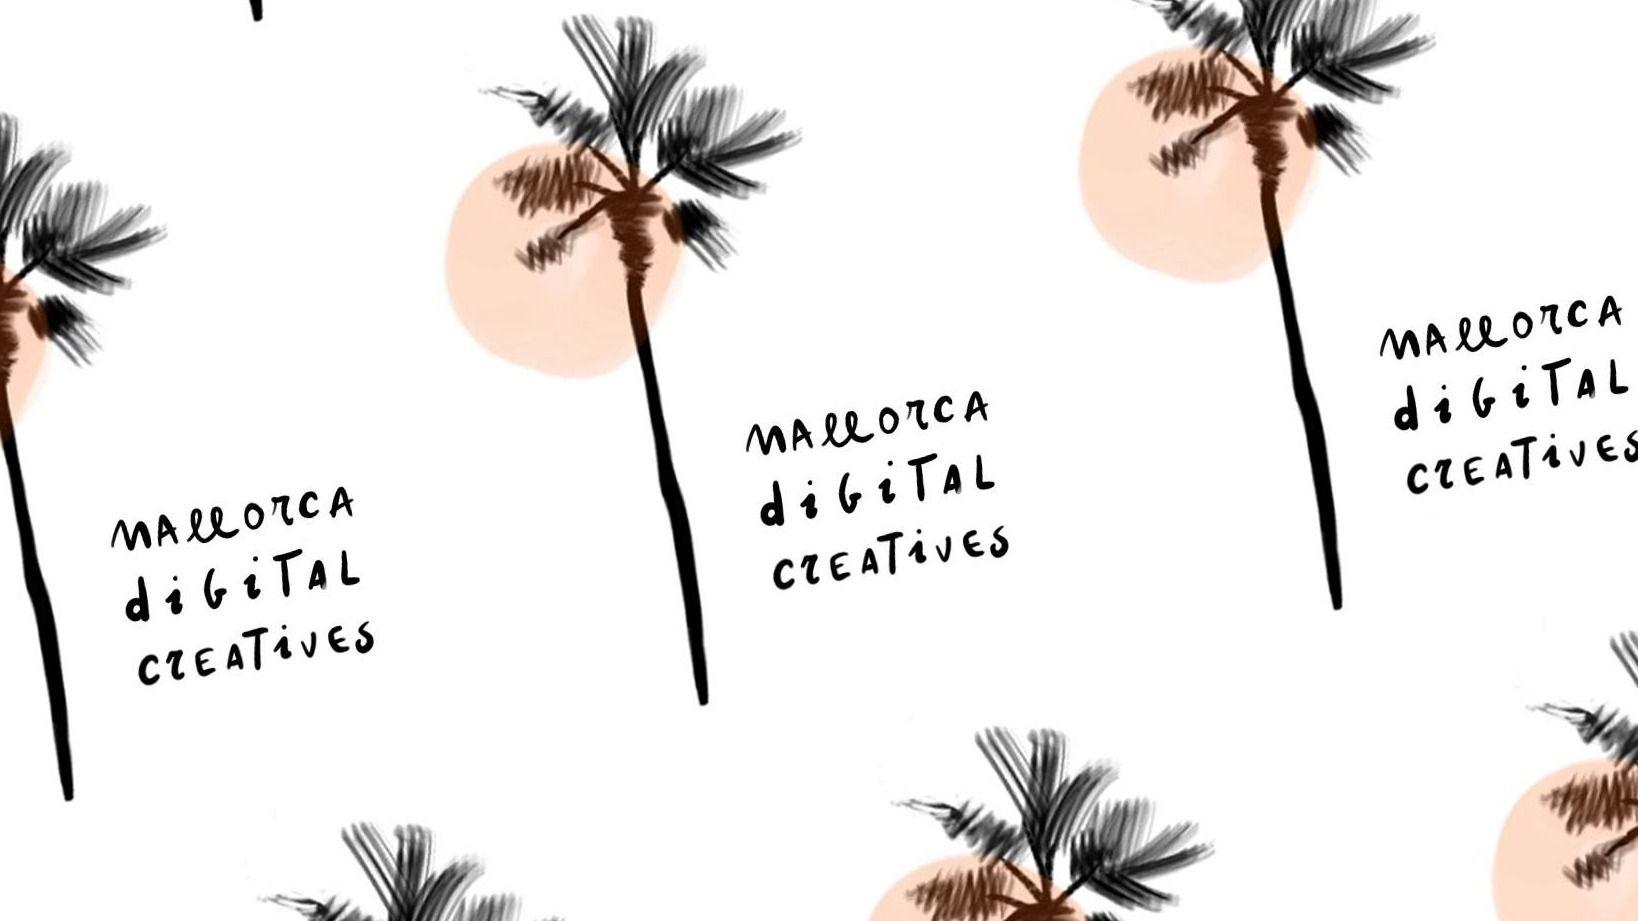 Mallorca Digital Creatives